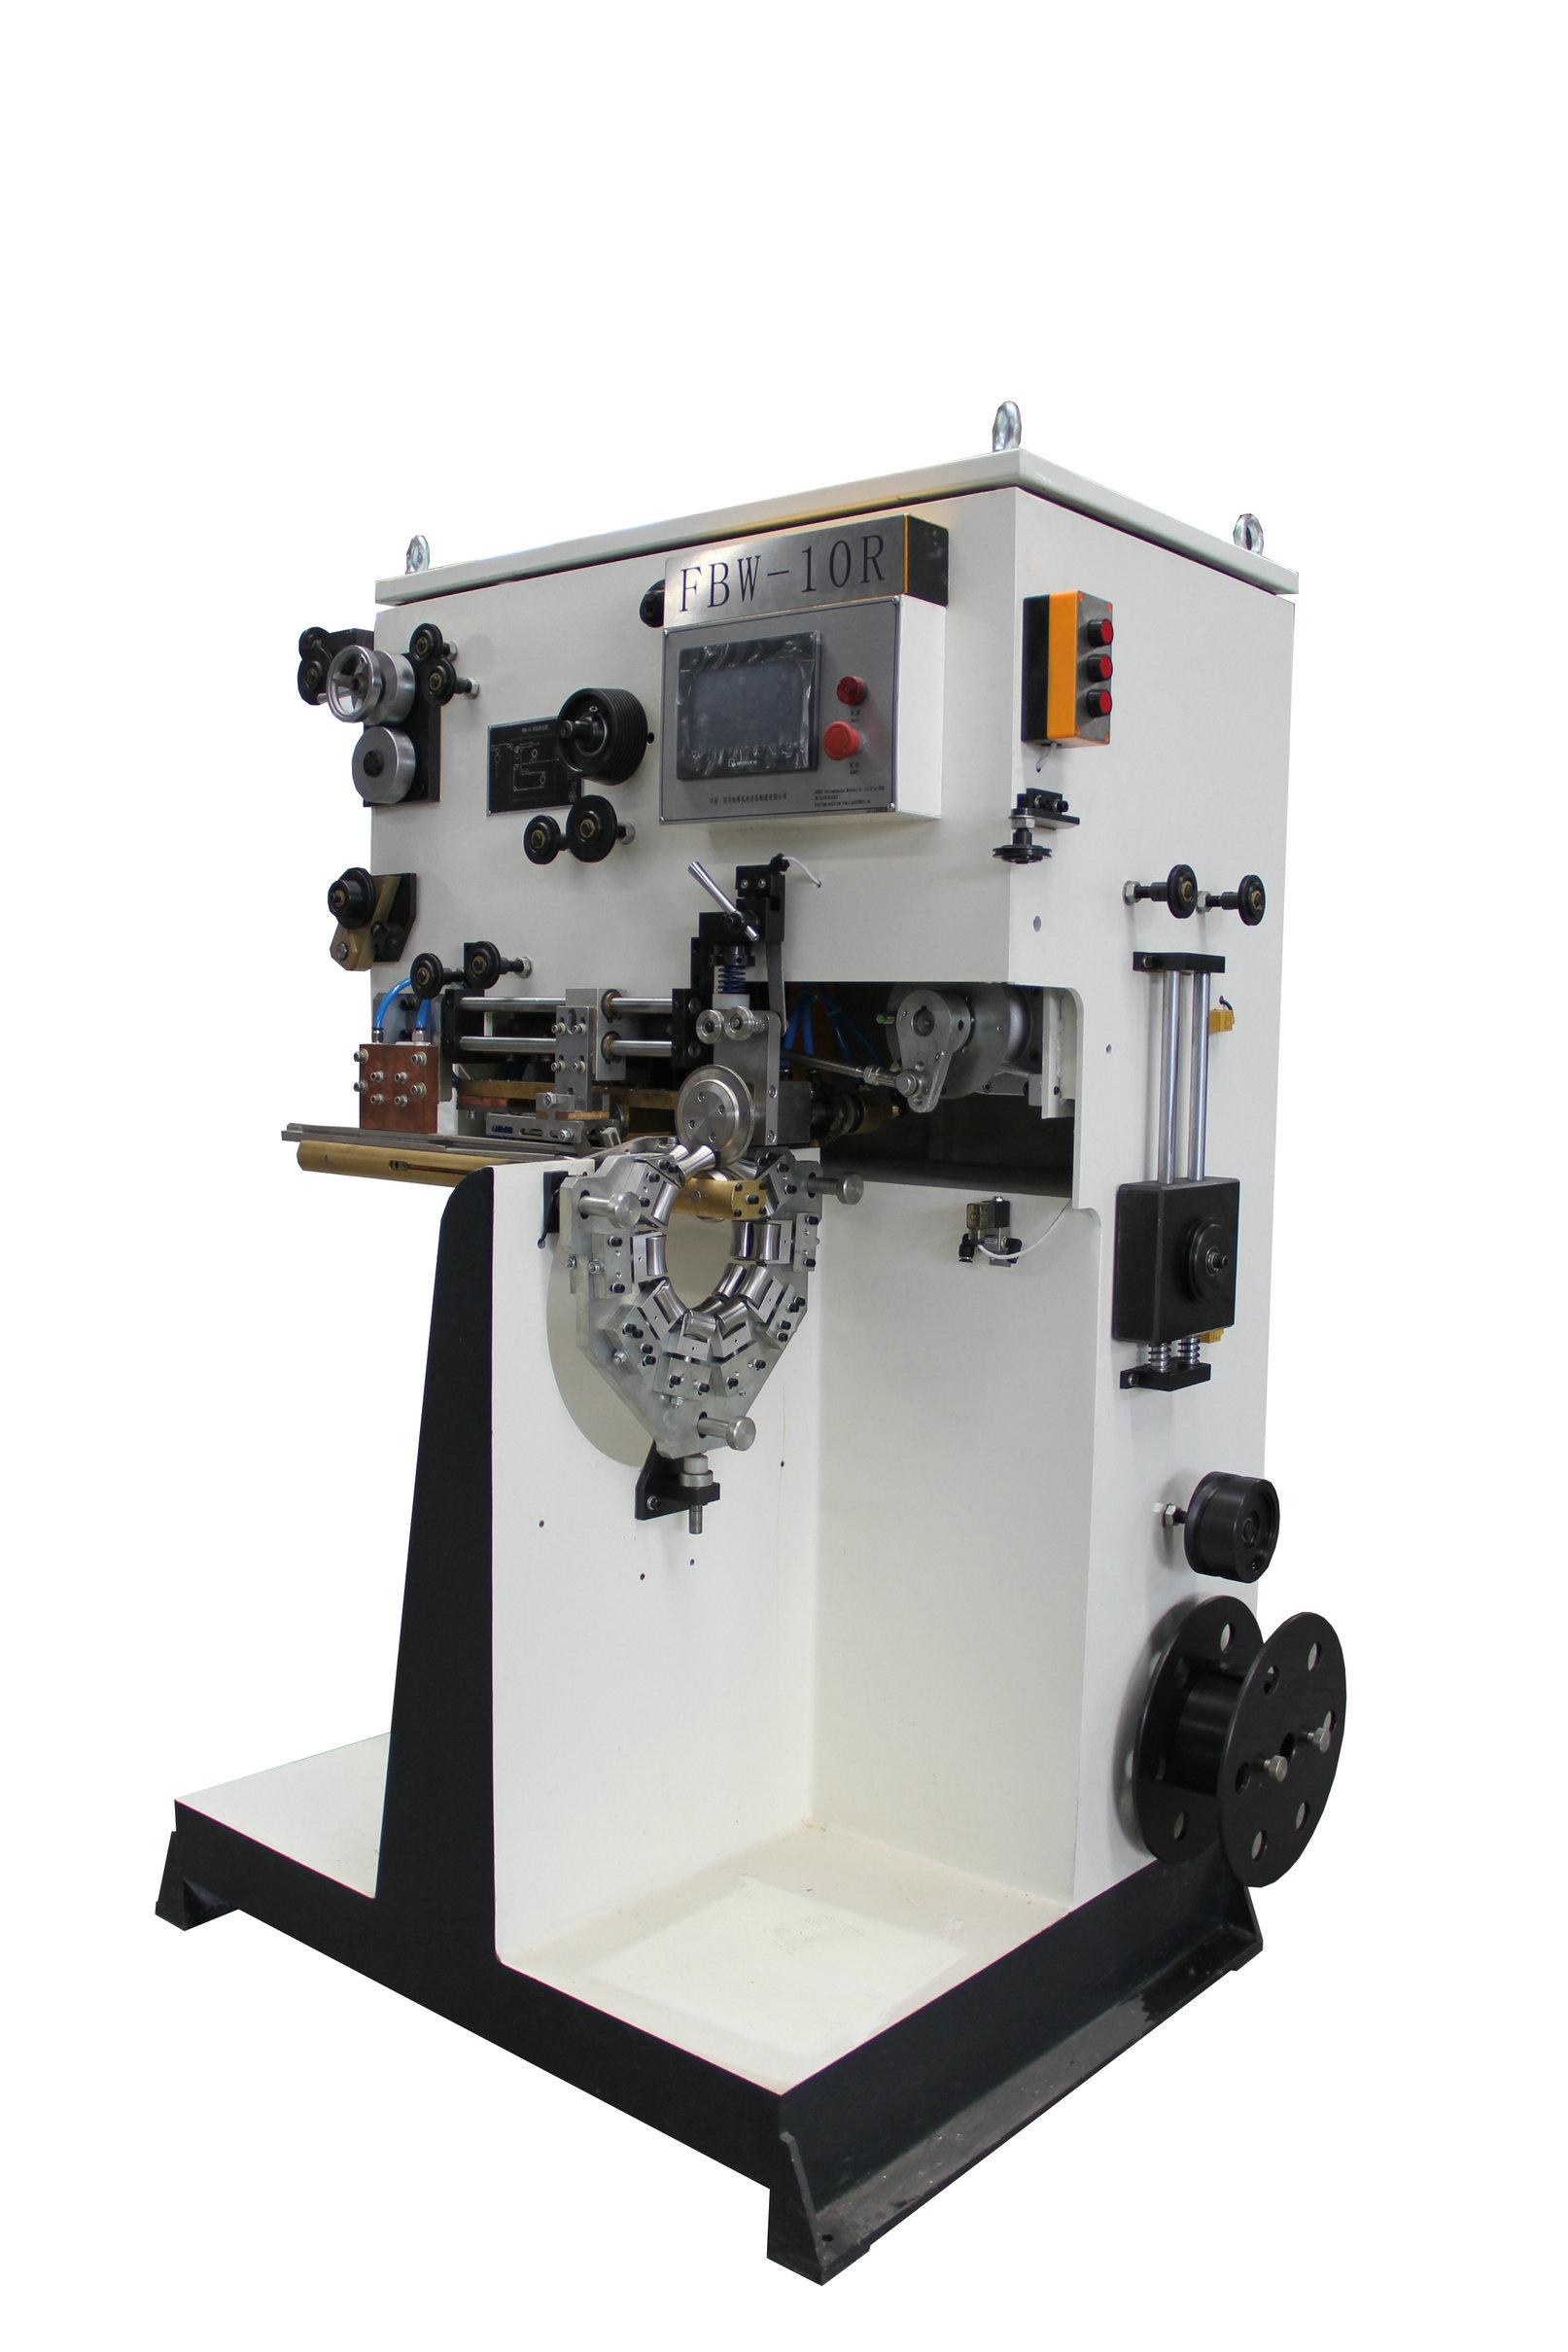 Tin can side seam welding machine